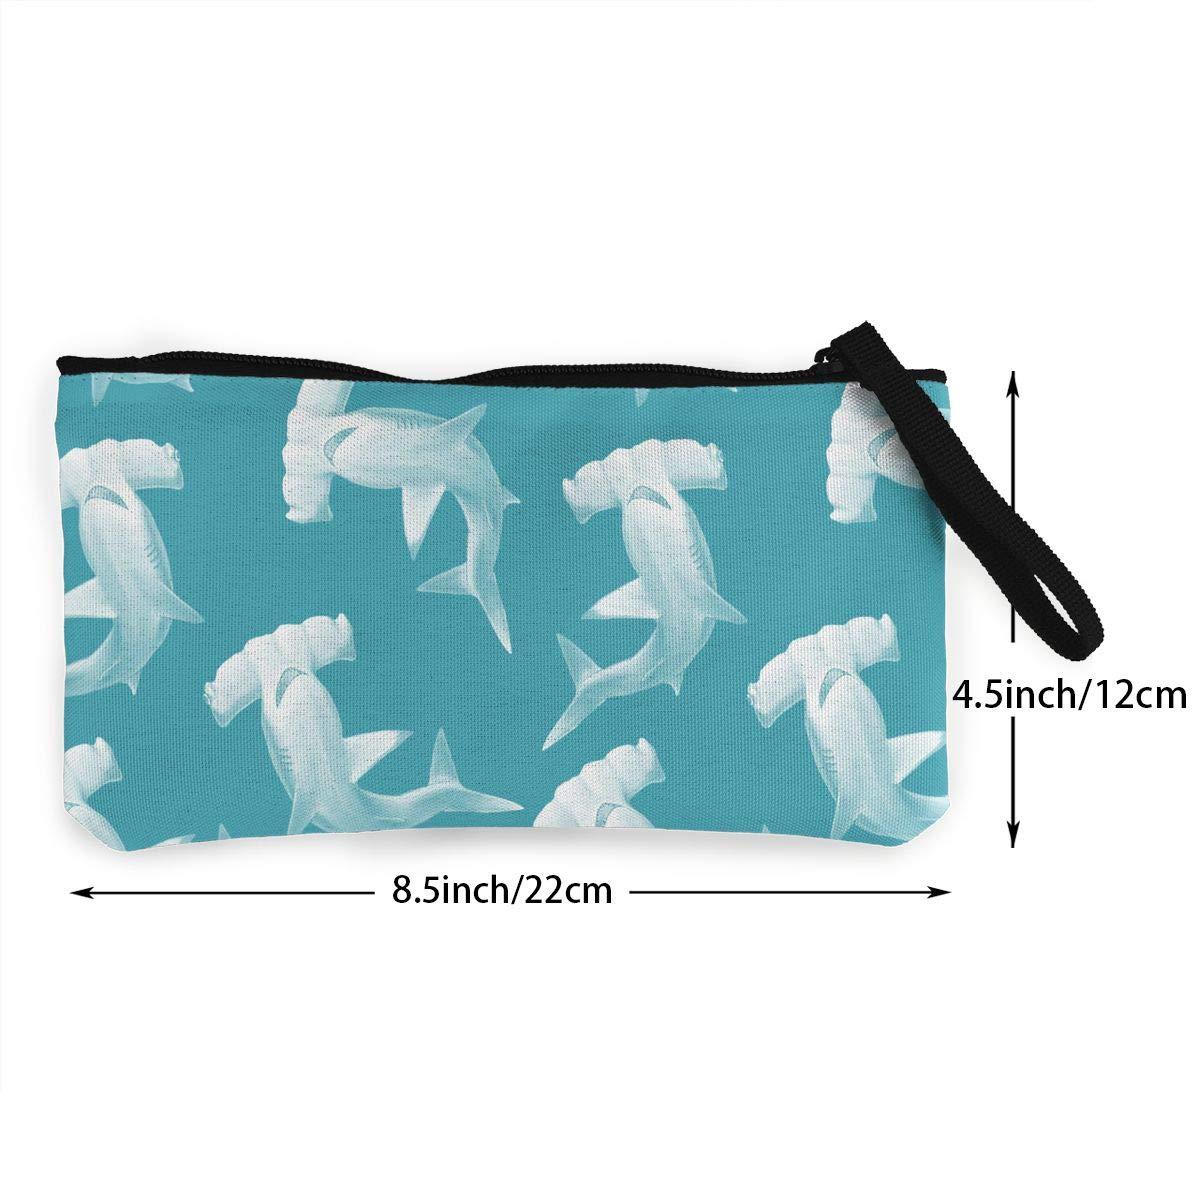 Bk55Oi/&/& Womens Fashion Purse Hammerhead Shark Pattern Canvas Makeup Bag with Zipper for Women